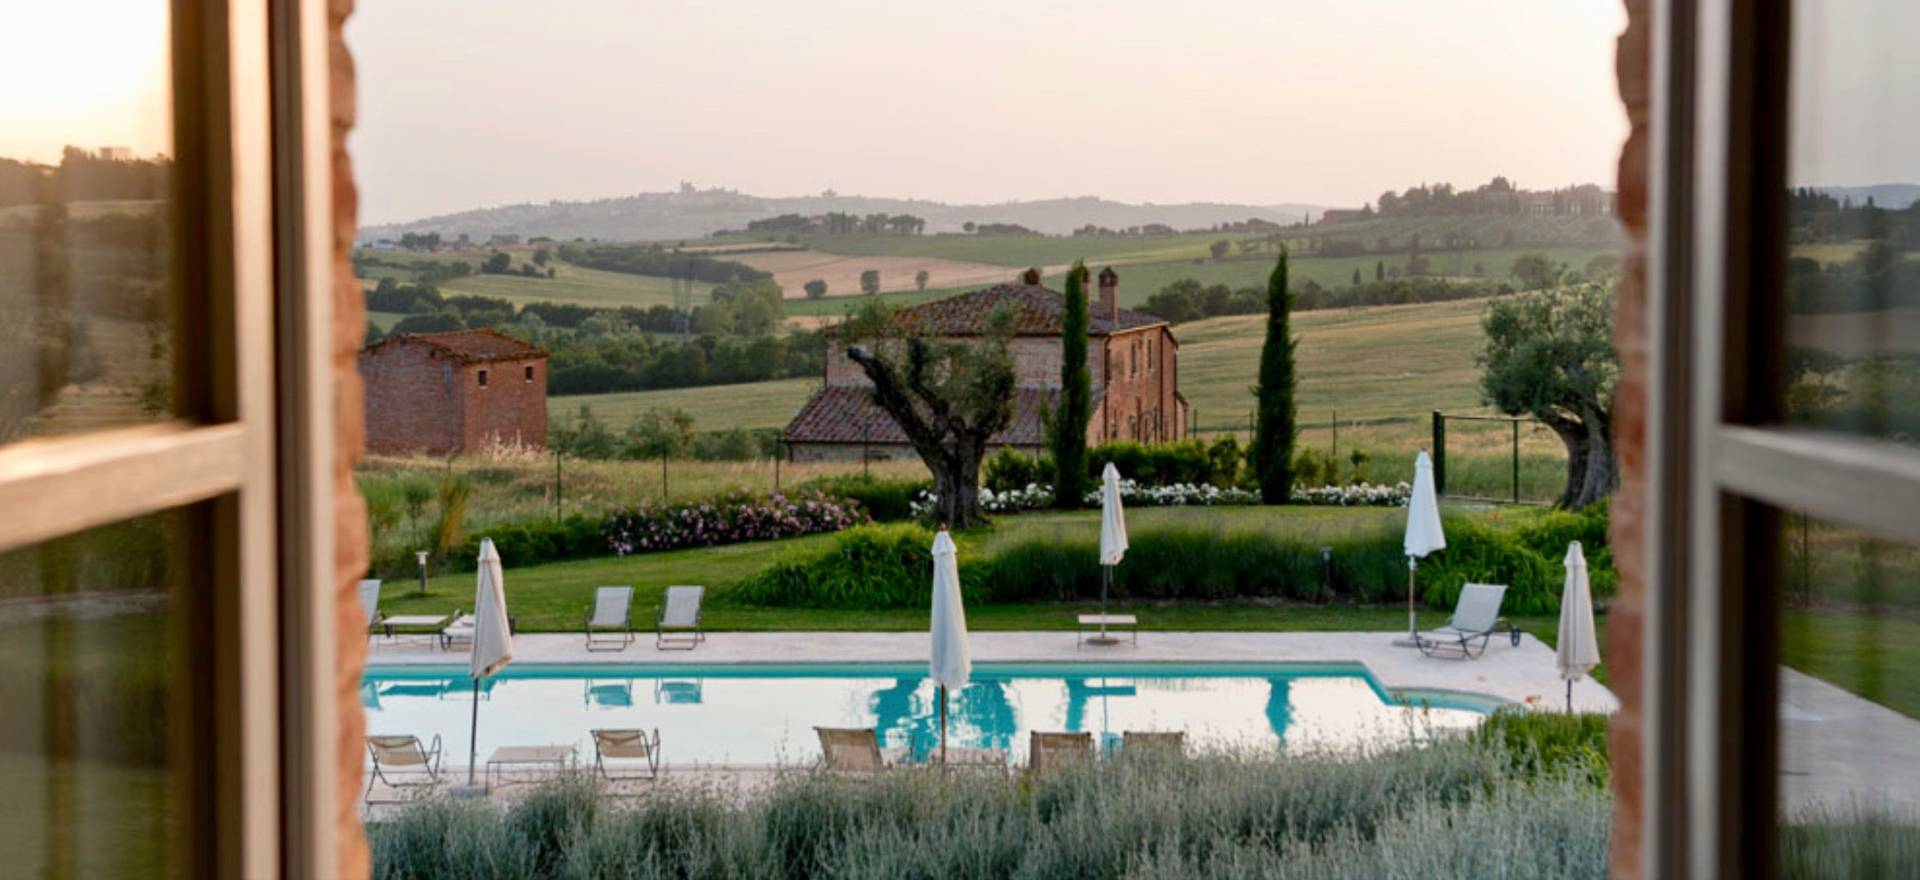 Agriturismo Toscana Agriturismo Toscana, molto attraente e ospitale